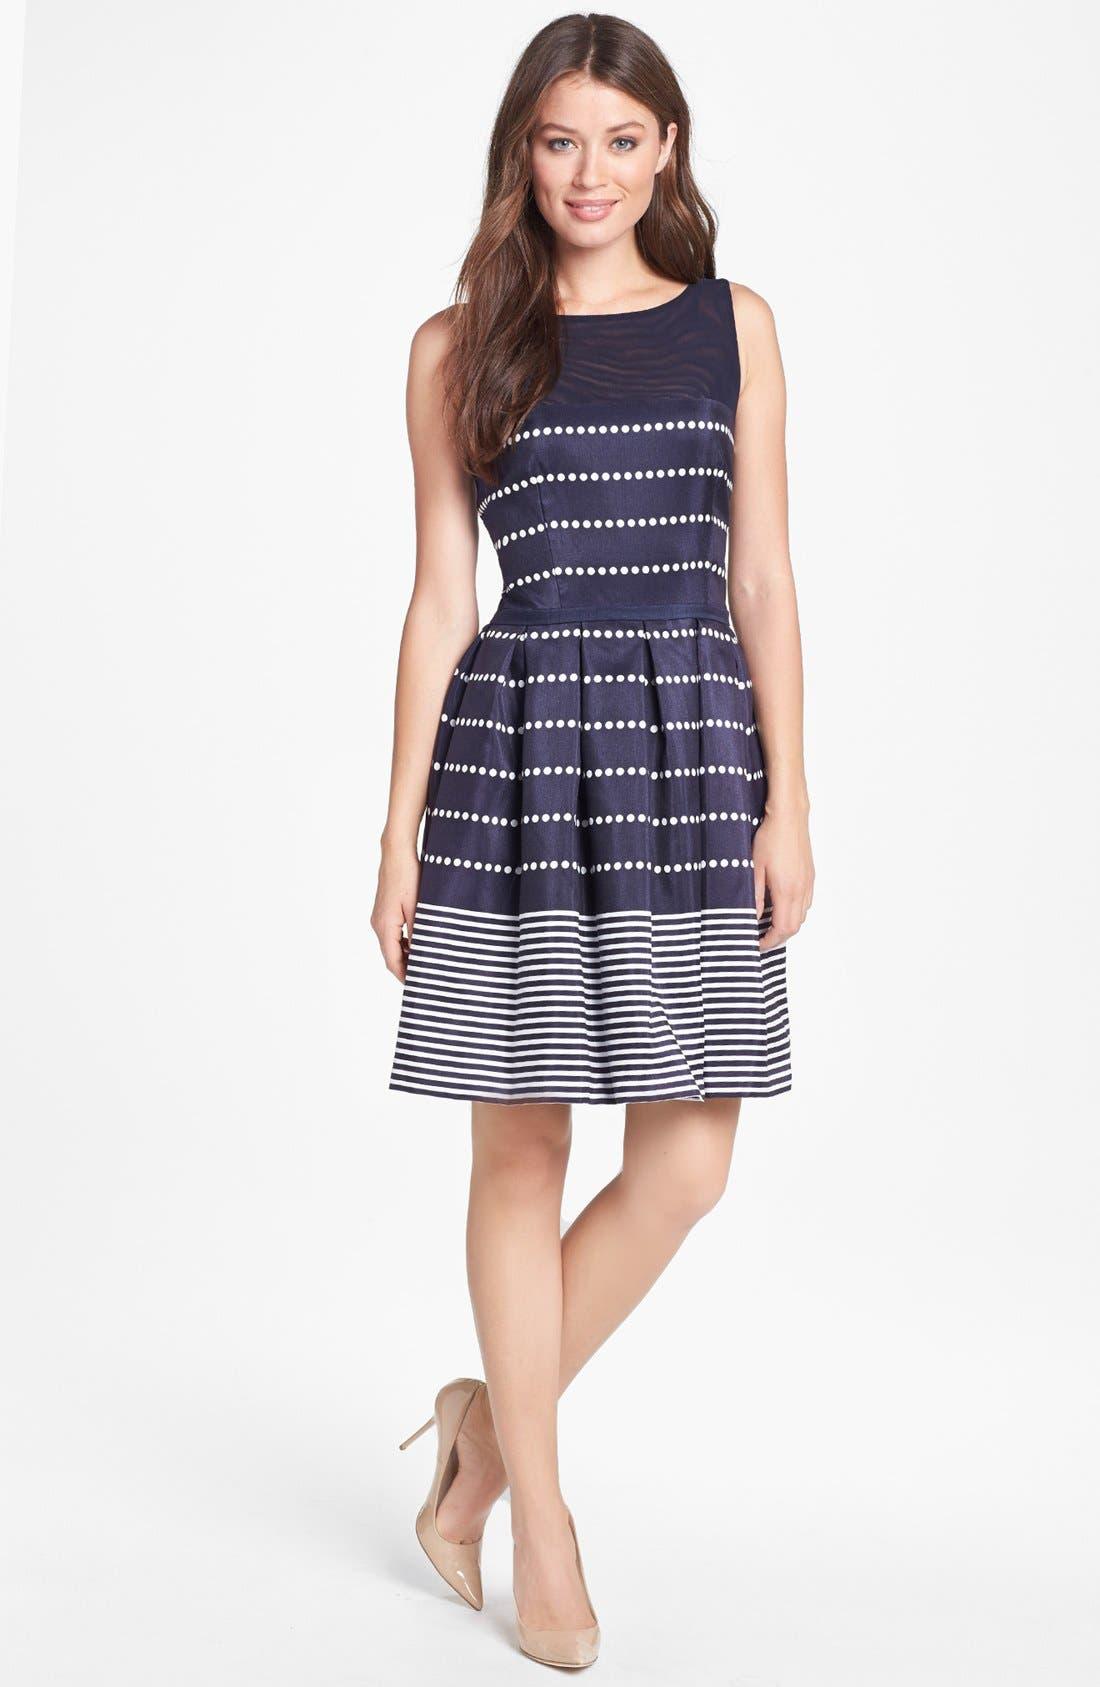 Main Image - Taylor Dresses Polka Dot Stripe Fit & Flare Dress